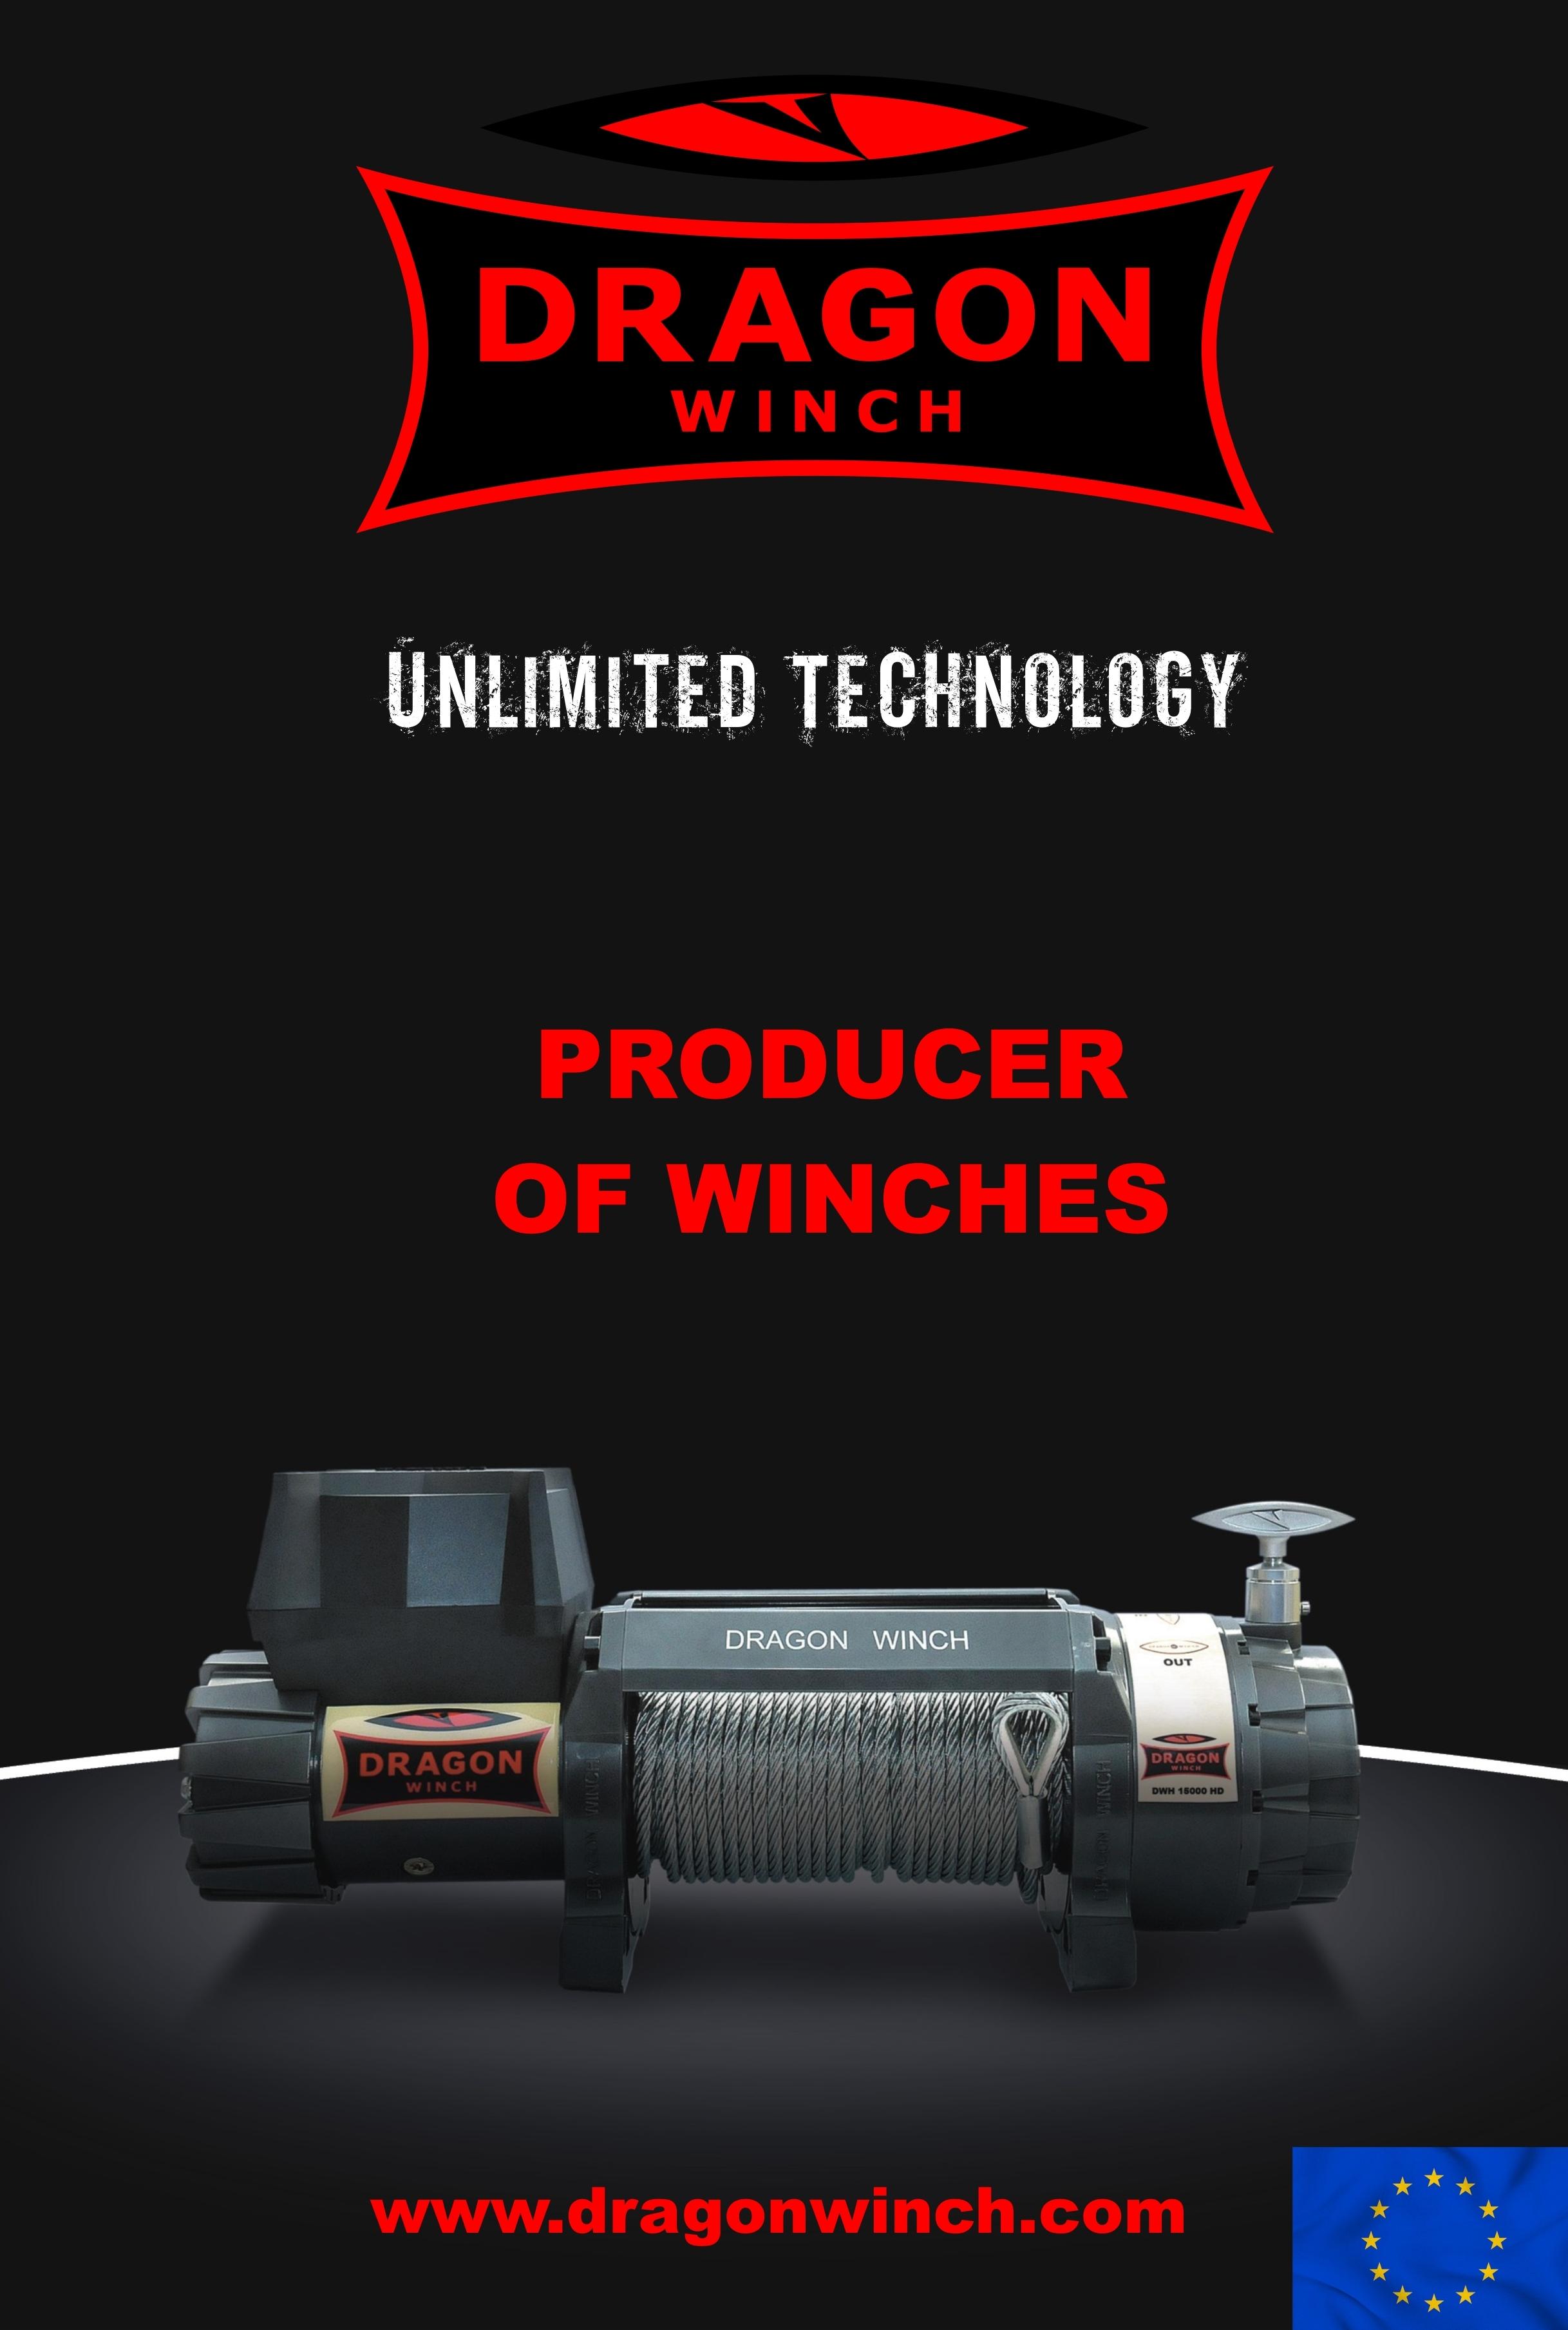 Remote Controls Dragon Winch Wiring Diagram Ulotka Targi 2015 Angielska Corel 10